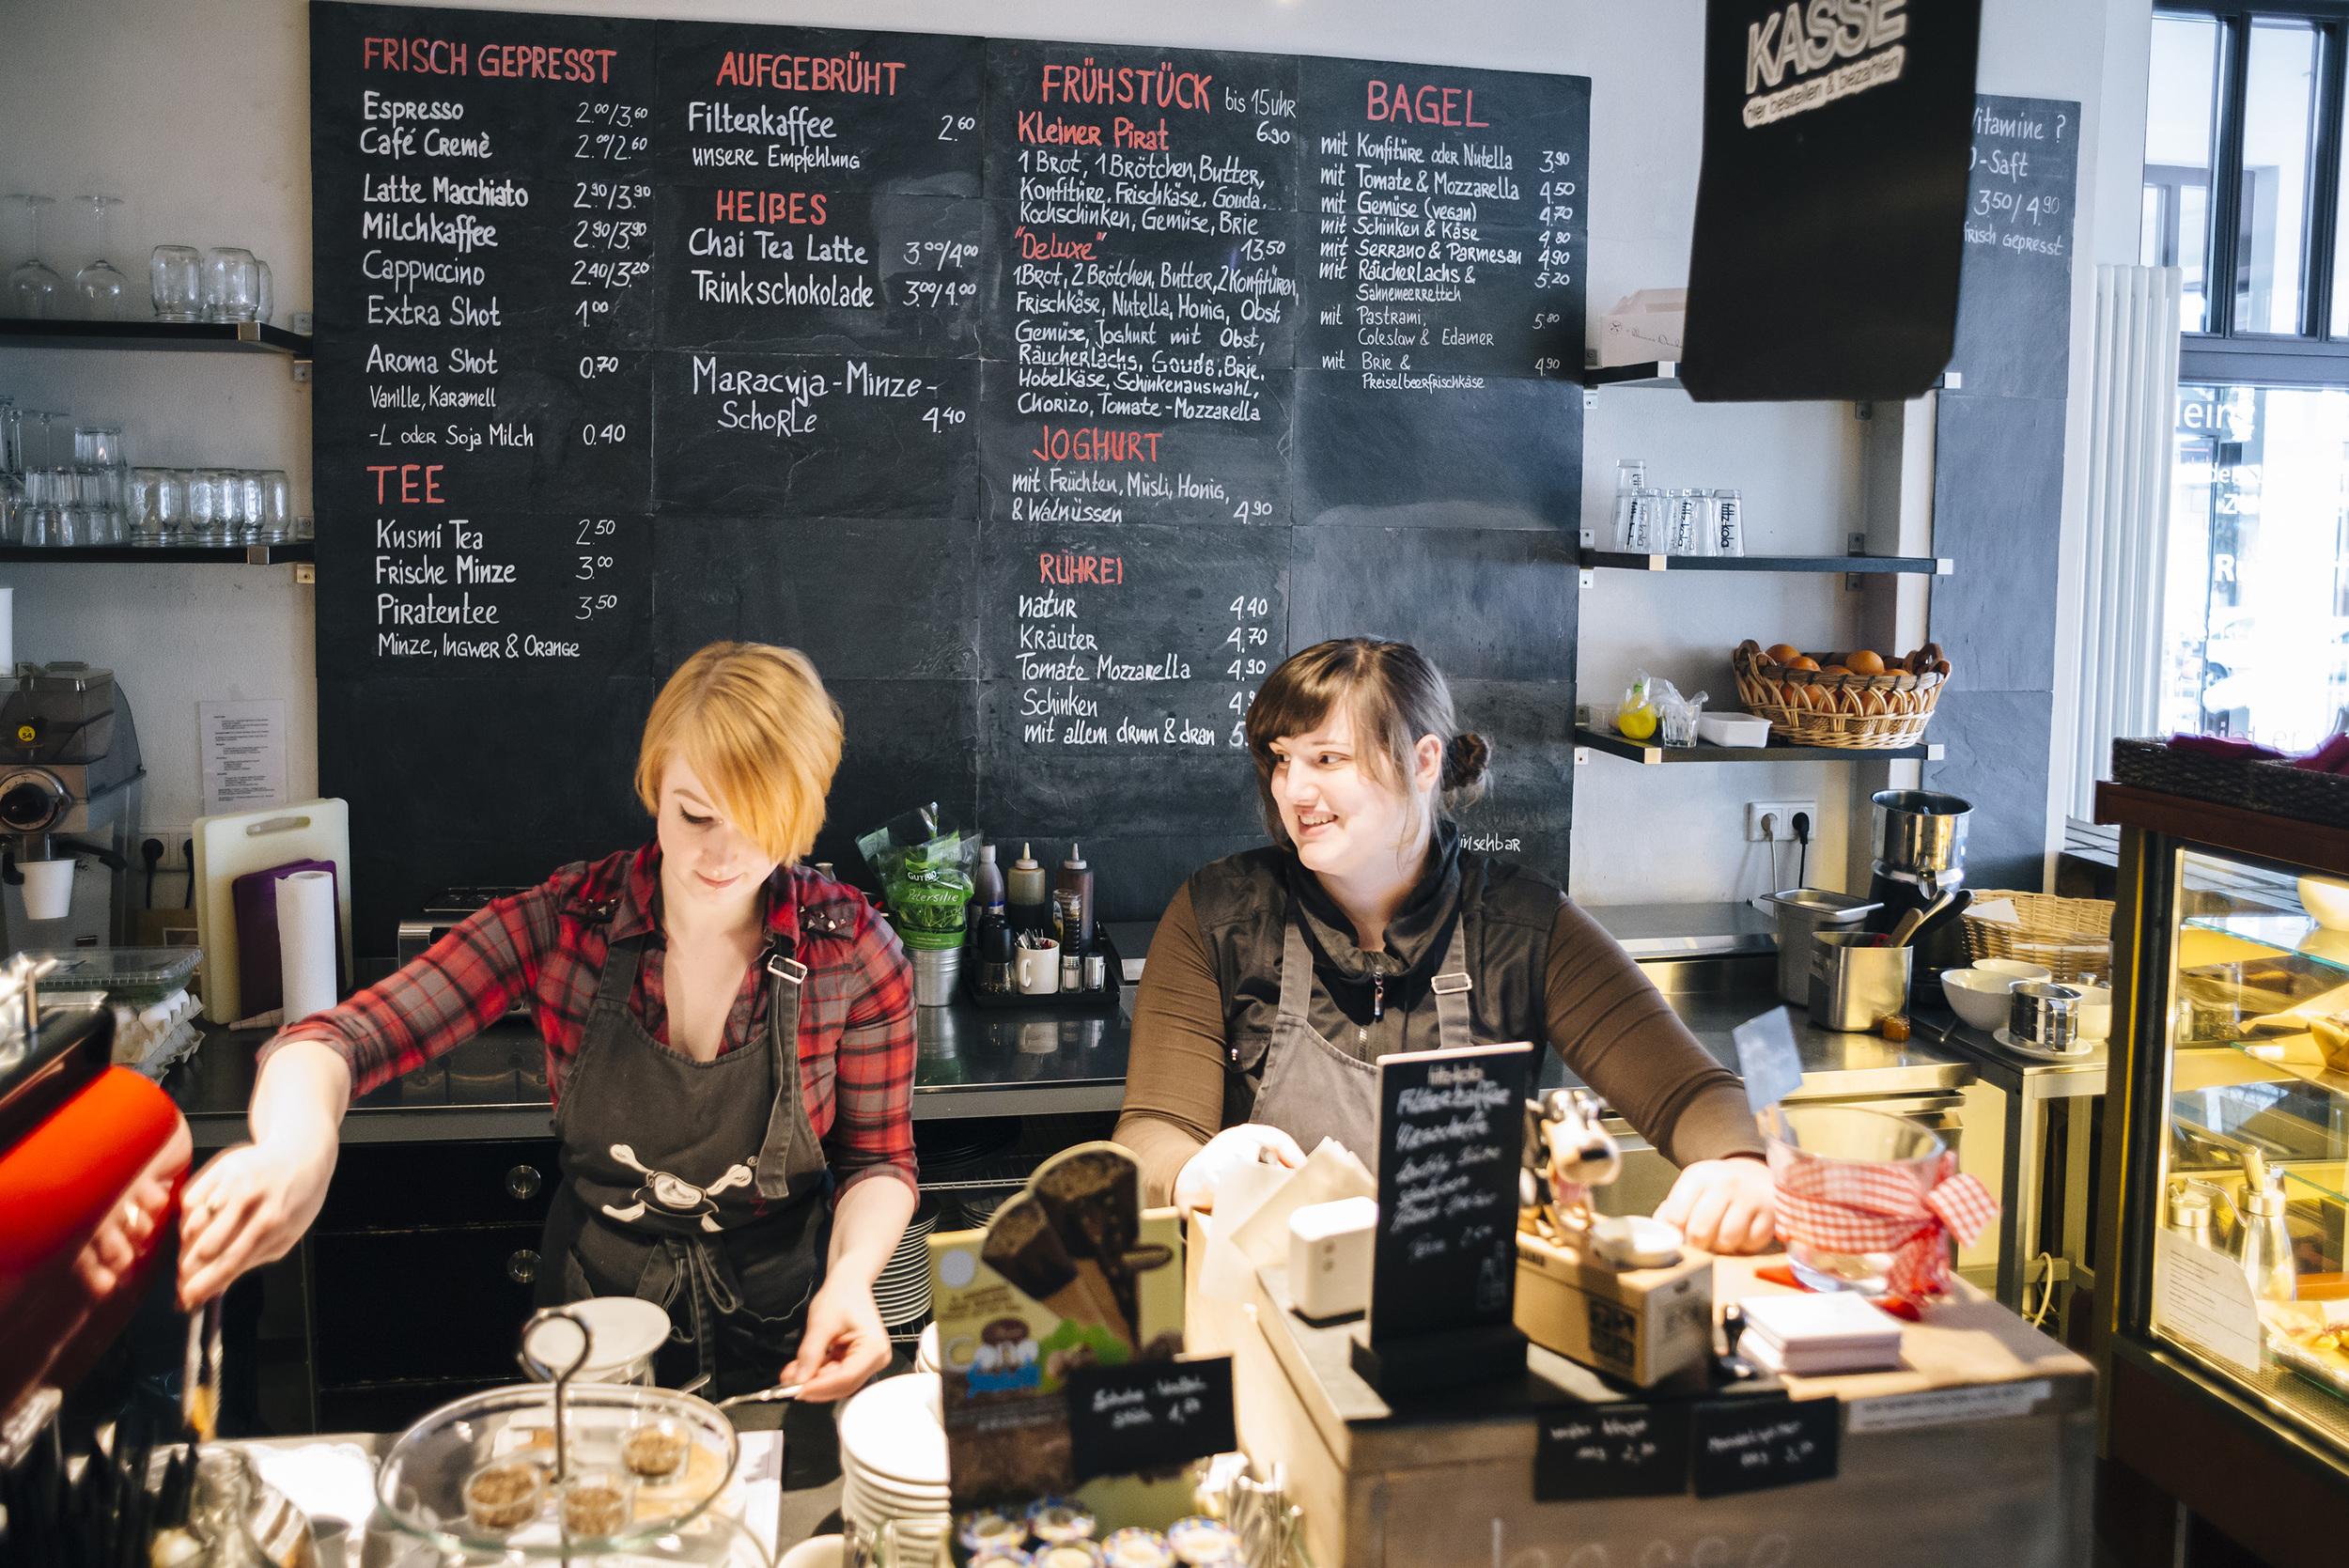 sweet-coffee-pirates-rüttenscheid-essen-pottspott-03.jpg